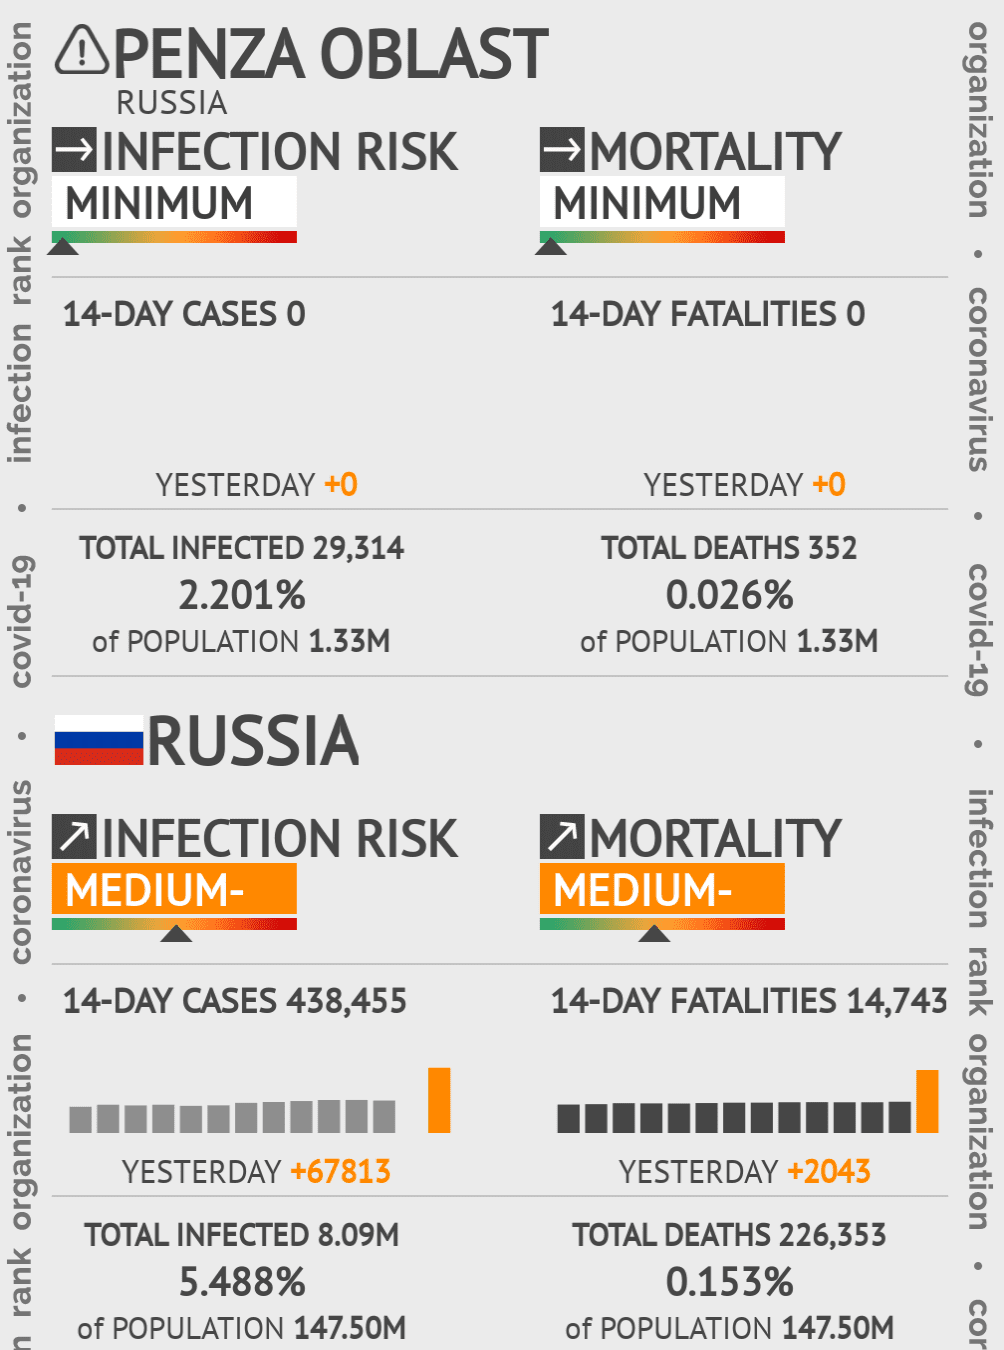 Penza Oblast Coronavirus Covid-19 Risk of Infection on March 06, 2021